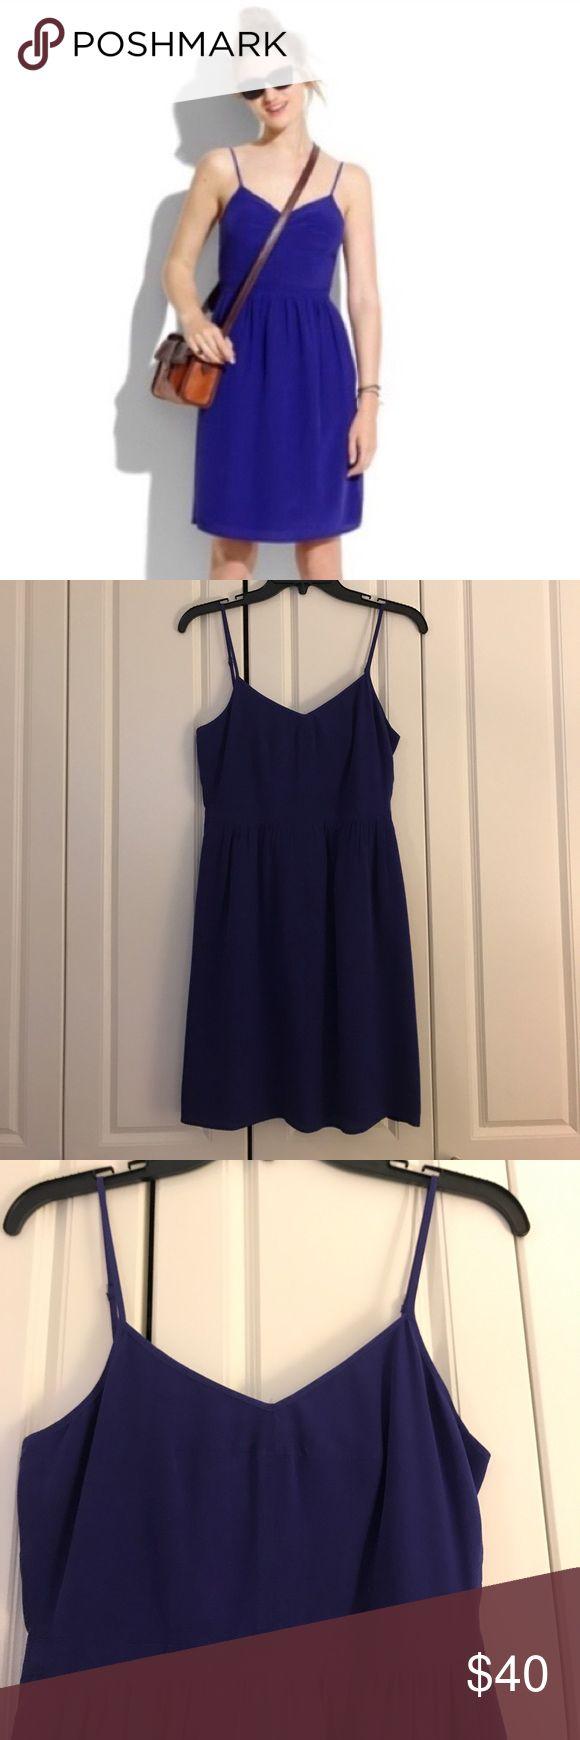 Madewell Silk Cami dress - Indigo - Size 2 Great condition Madewell silk cami dress! Madewell Dresses